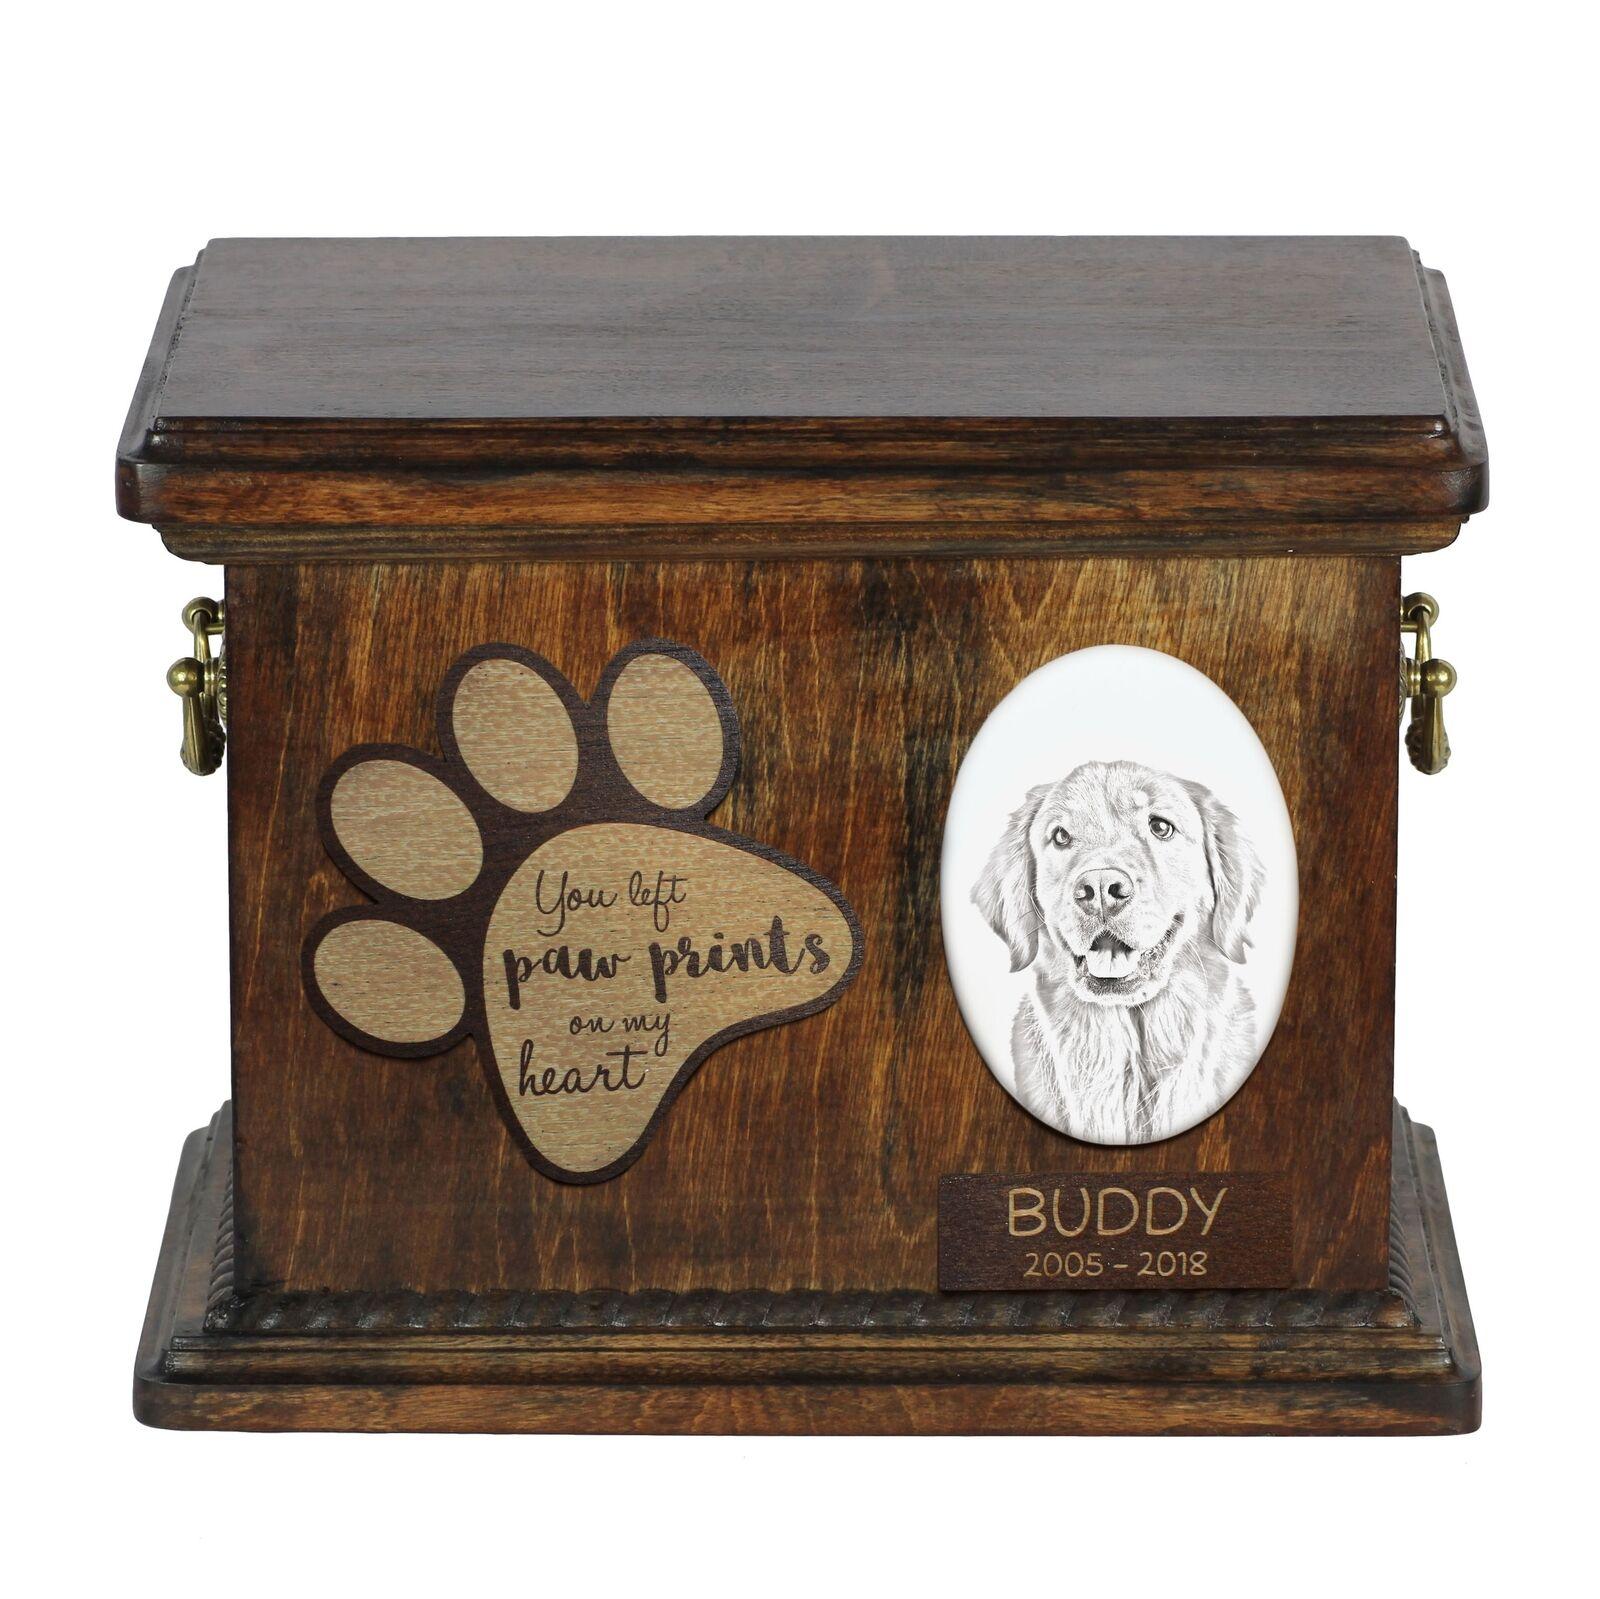 Golden Retriever  Urn for dog's ashes with ceramic plate and description,ArtDog